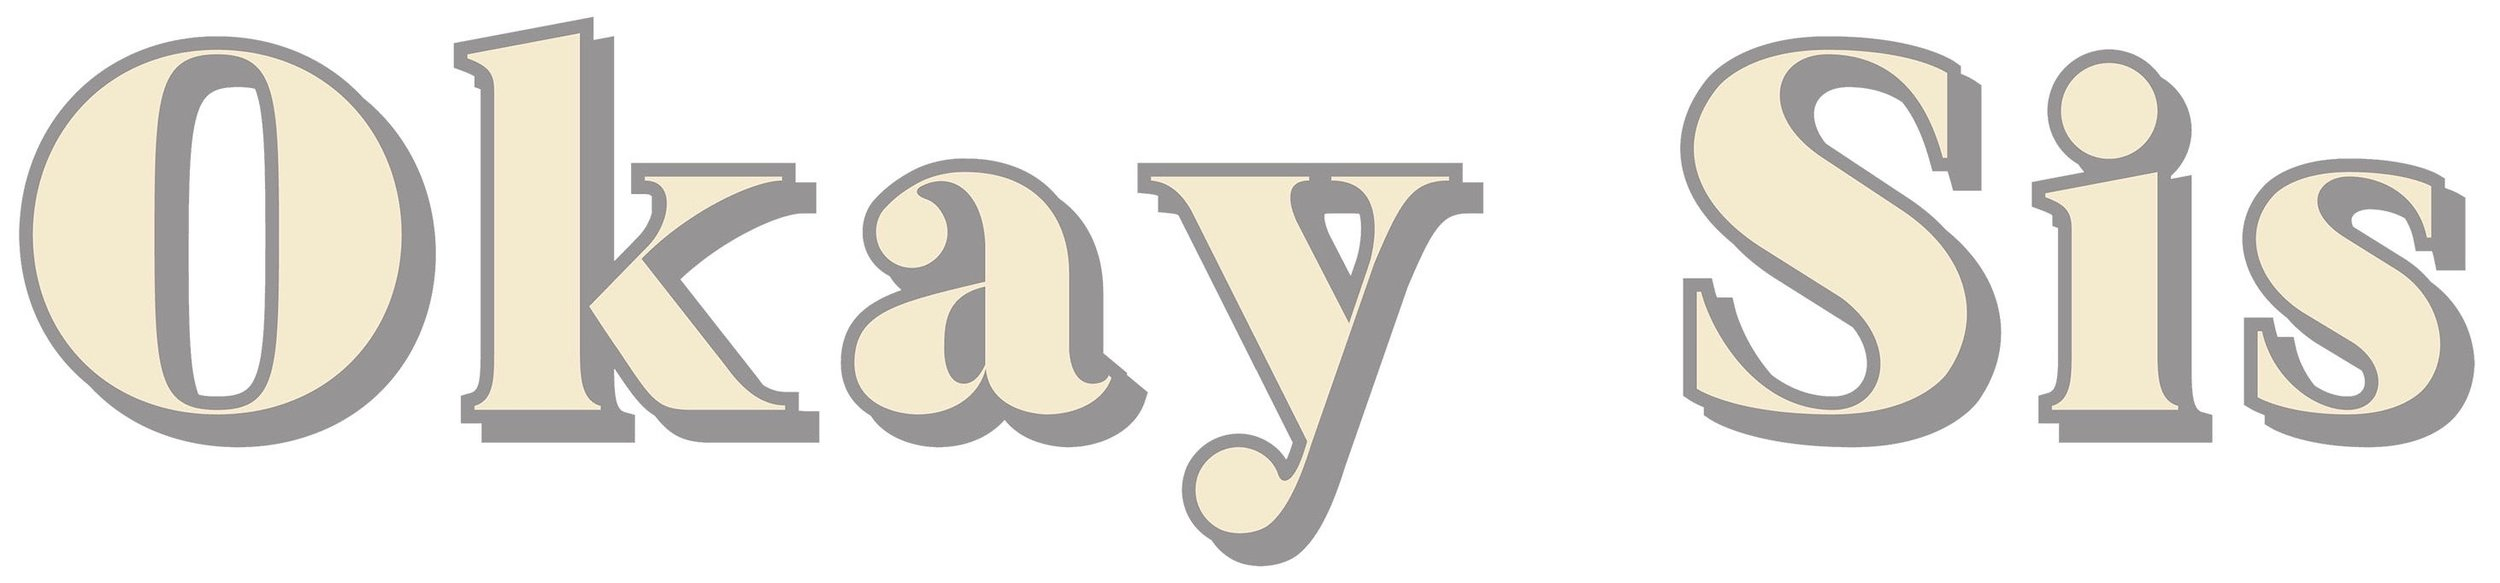 Okay sis logo (finals 1600x1600)